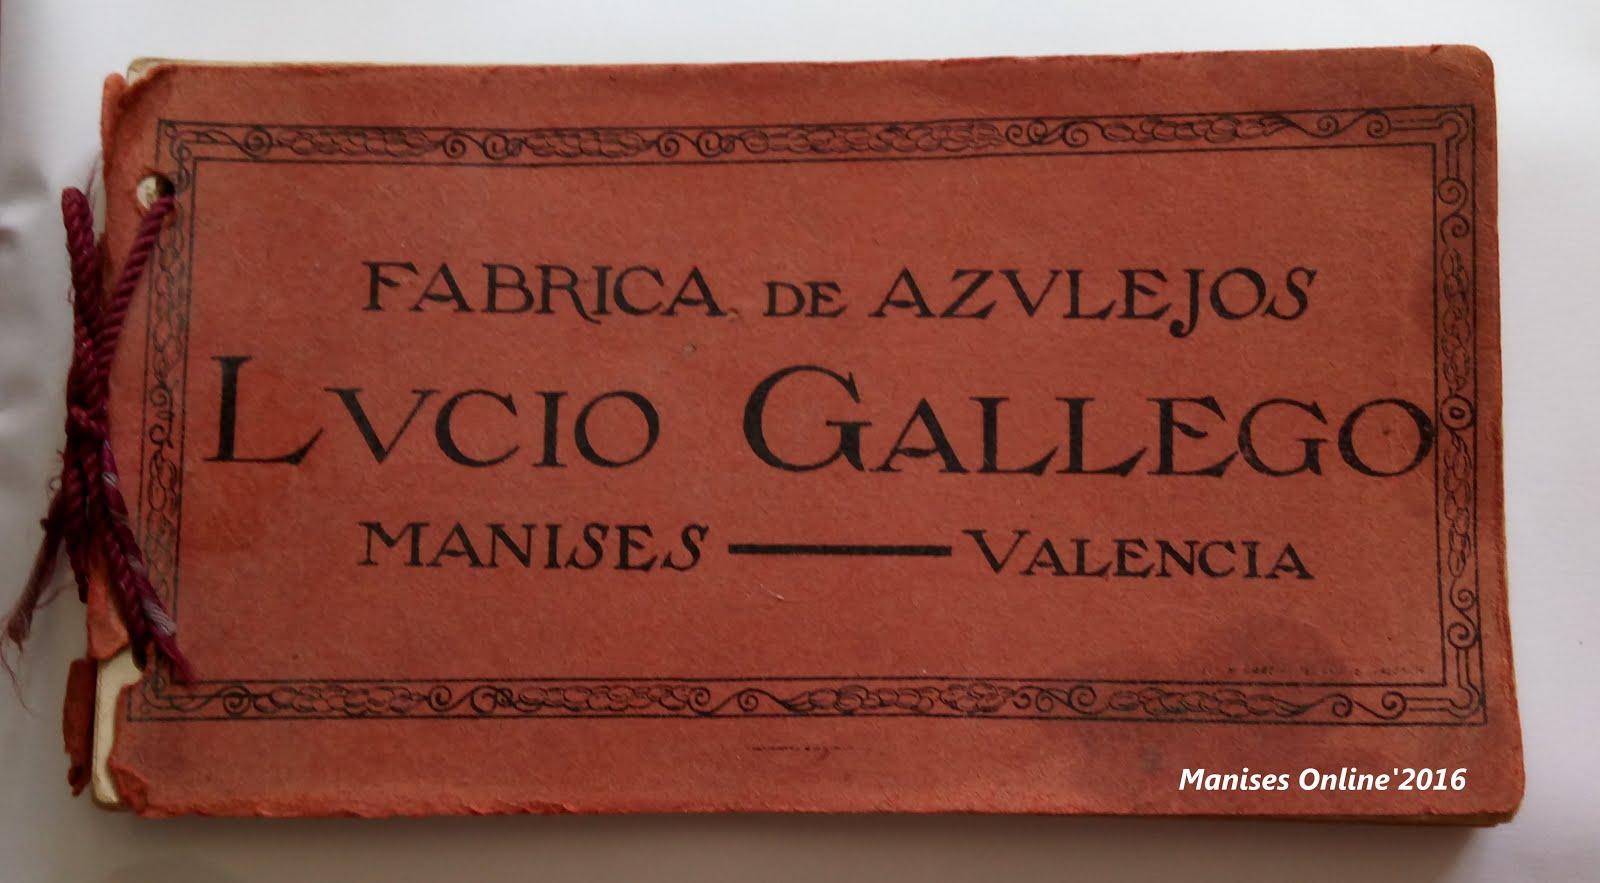 07.11.16 FÁBRICAS ANTIGUAS DE AZULEJOS DE MANISES: LUCIO GALLEGO HUERTA